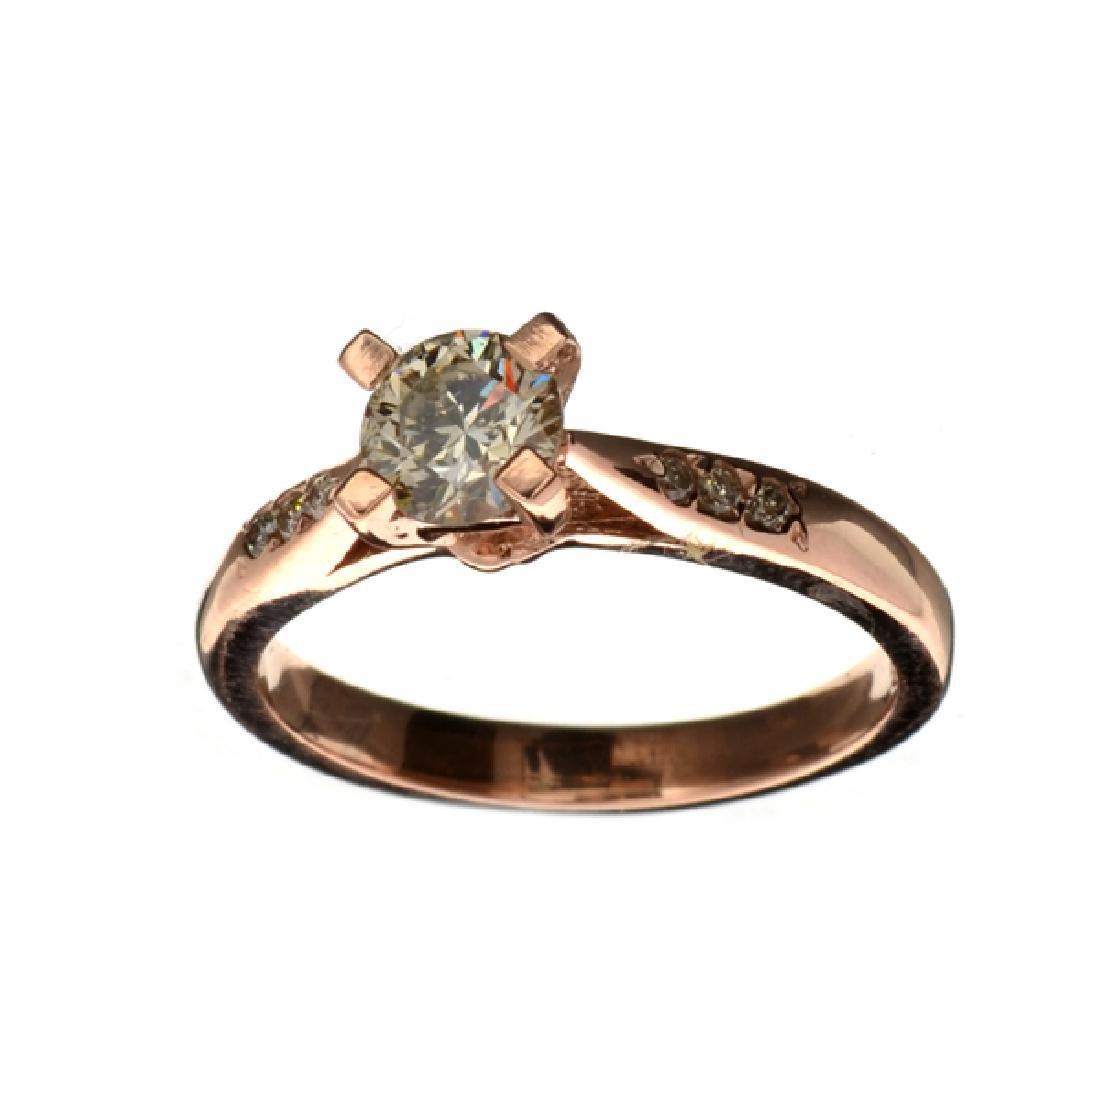 APP: 5.6k Fine Jewelry 14 kt. Rose Gold, 0.64CT Round